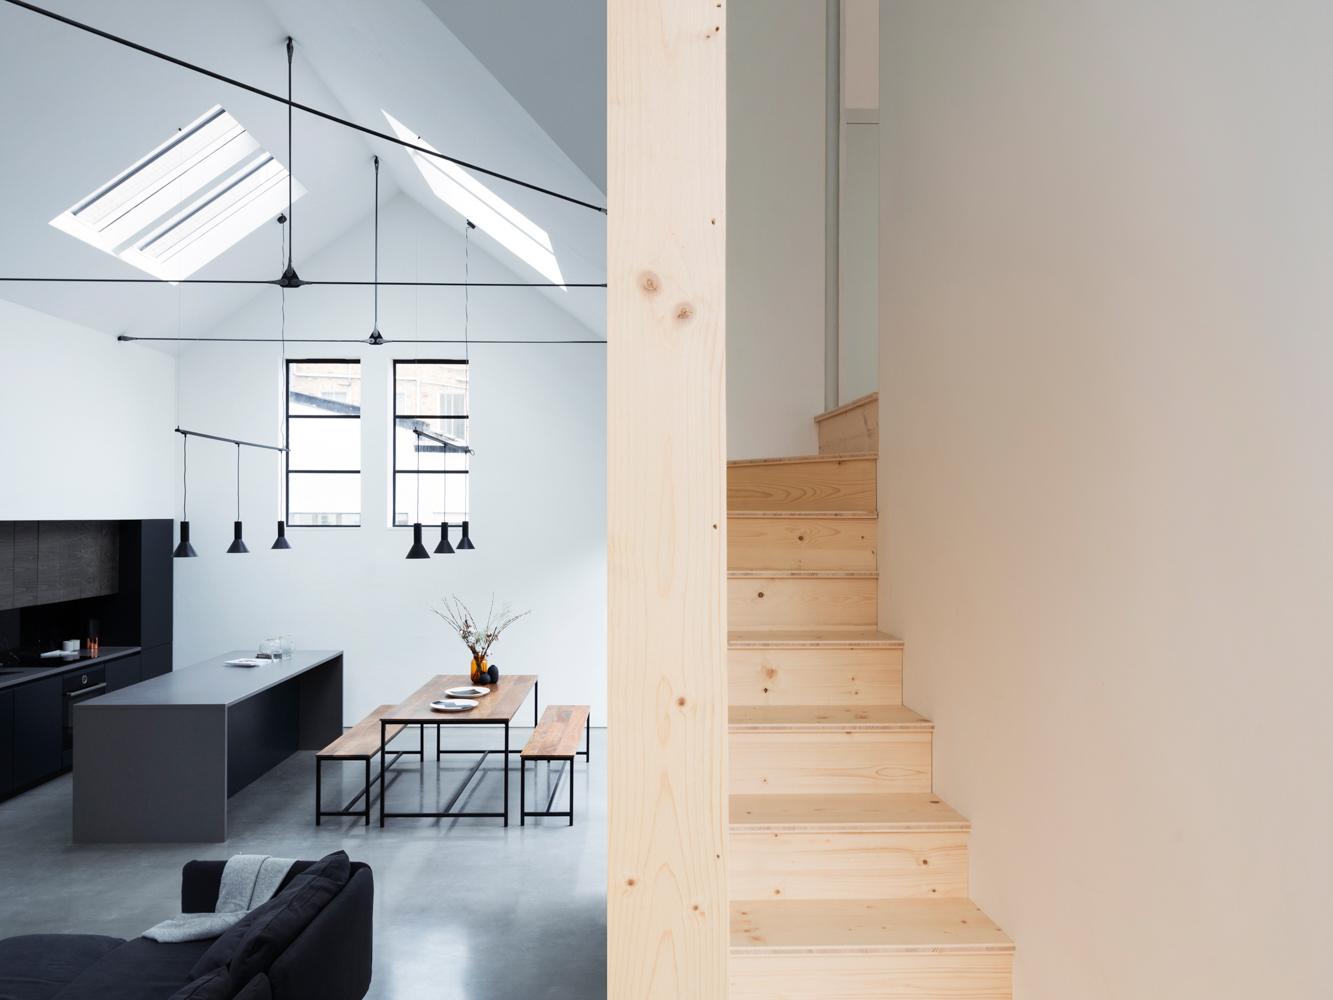 defoe-road-paper-house-project-the-design-emotive-10.jpg